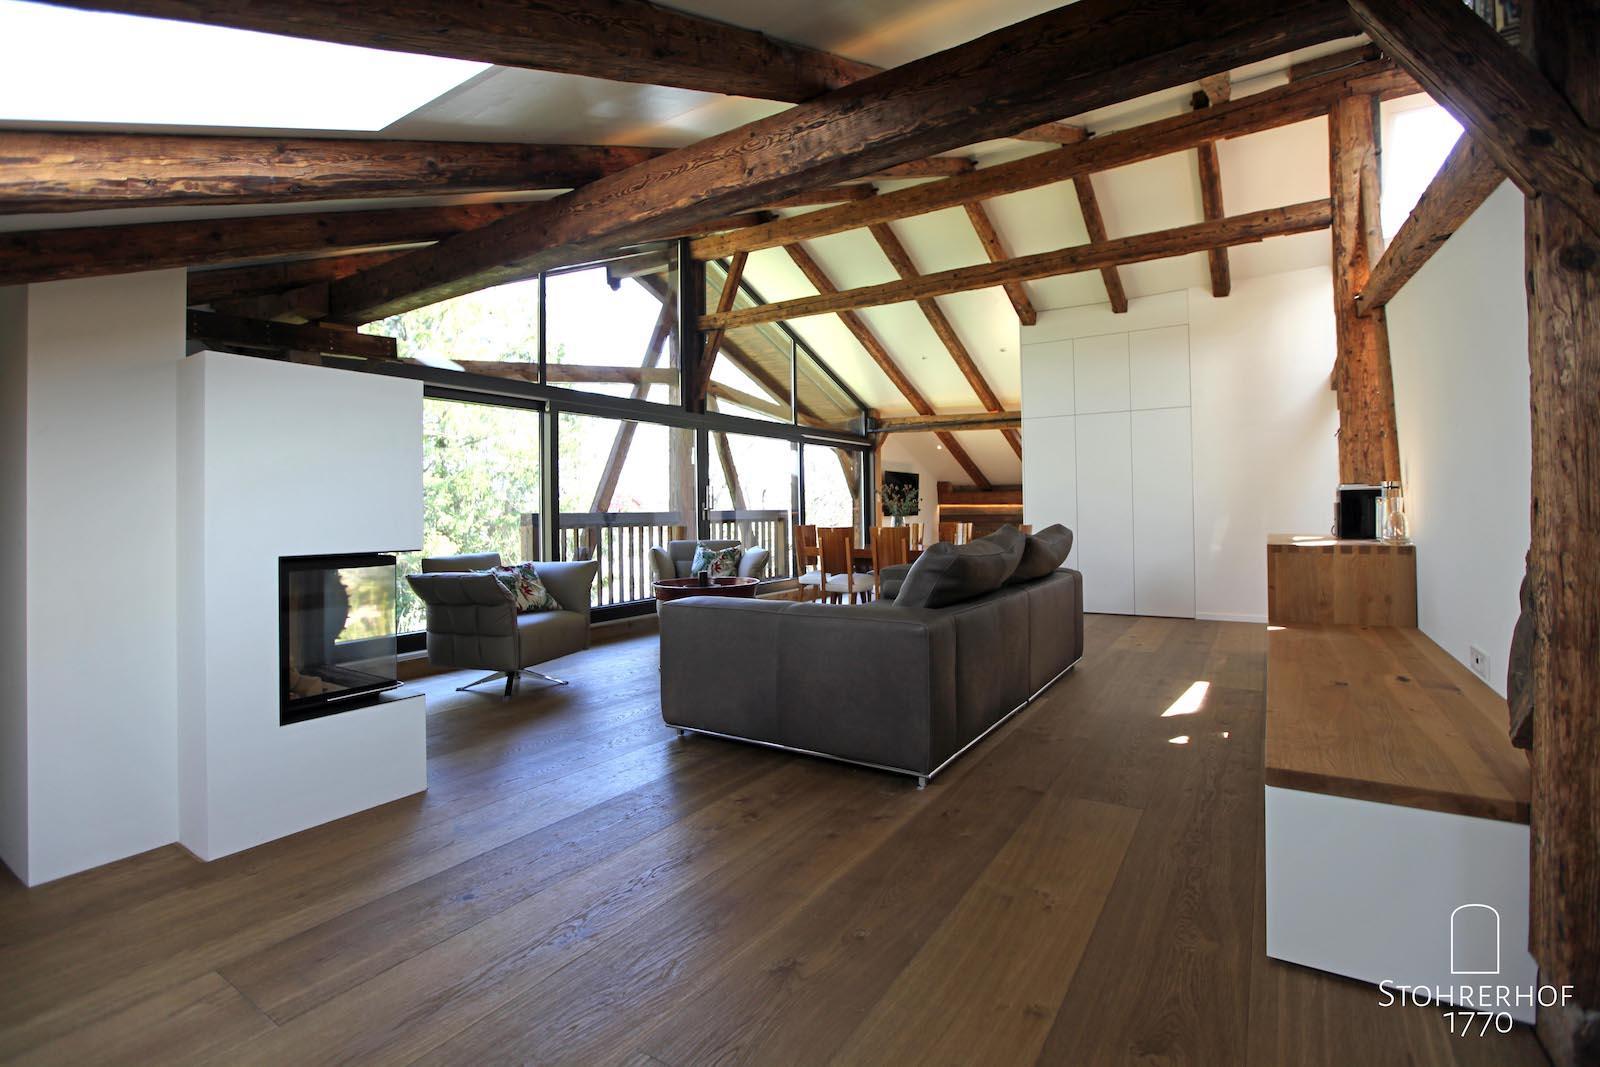 42-Penthouse-Blick-vom-linken-Bett-auf-Kamin-Sofa-Sessel-Wohnen-4-K